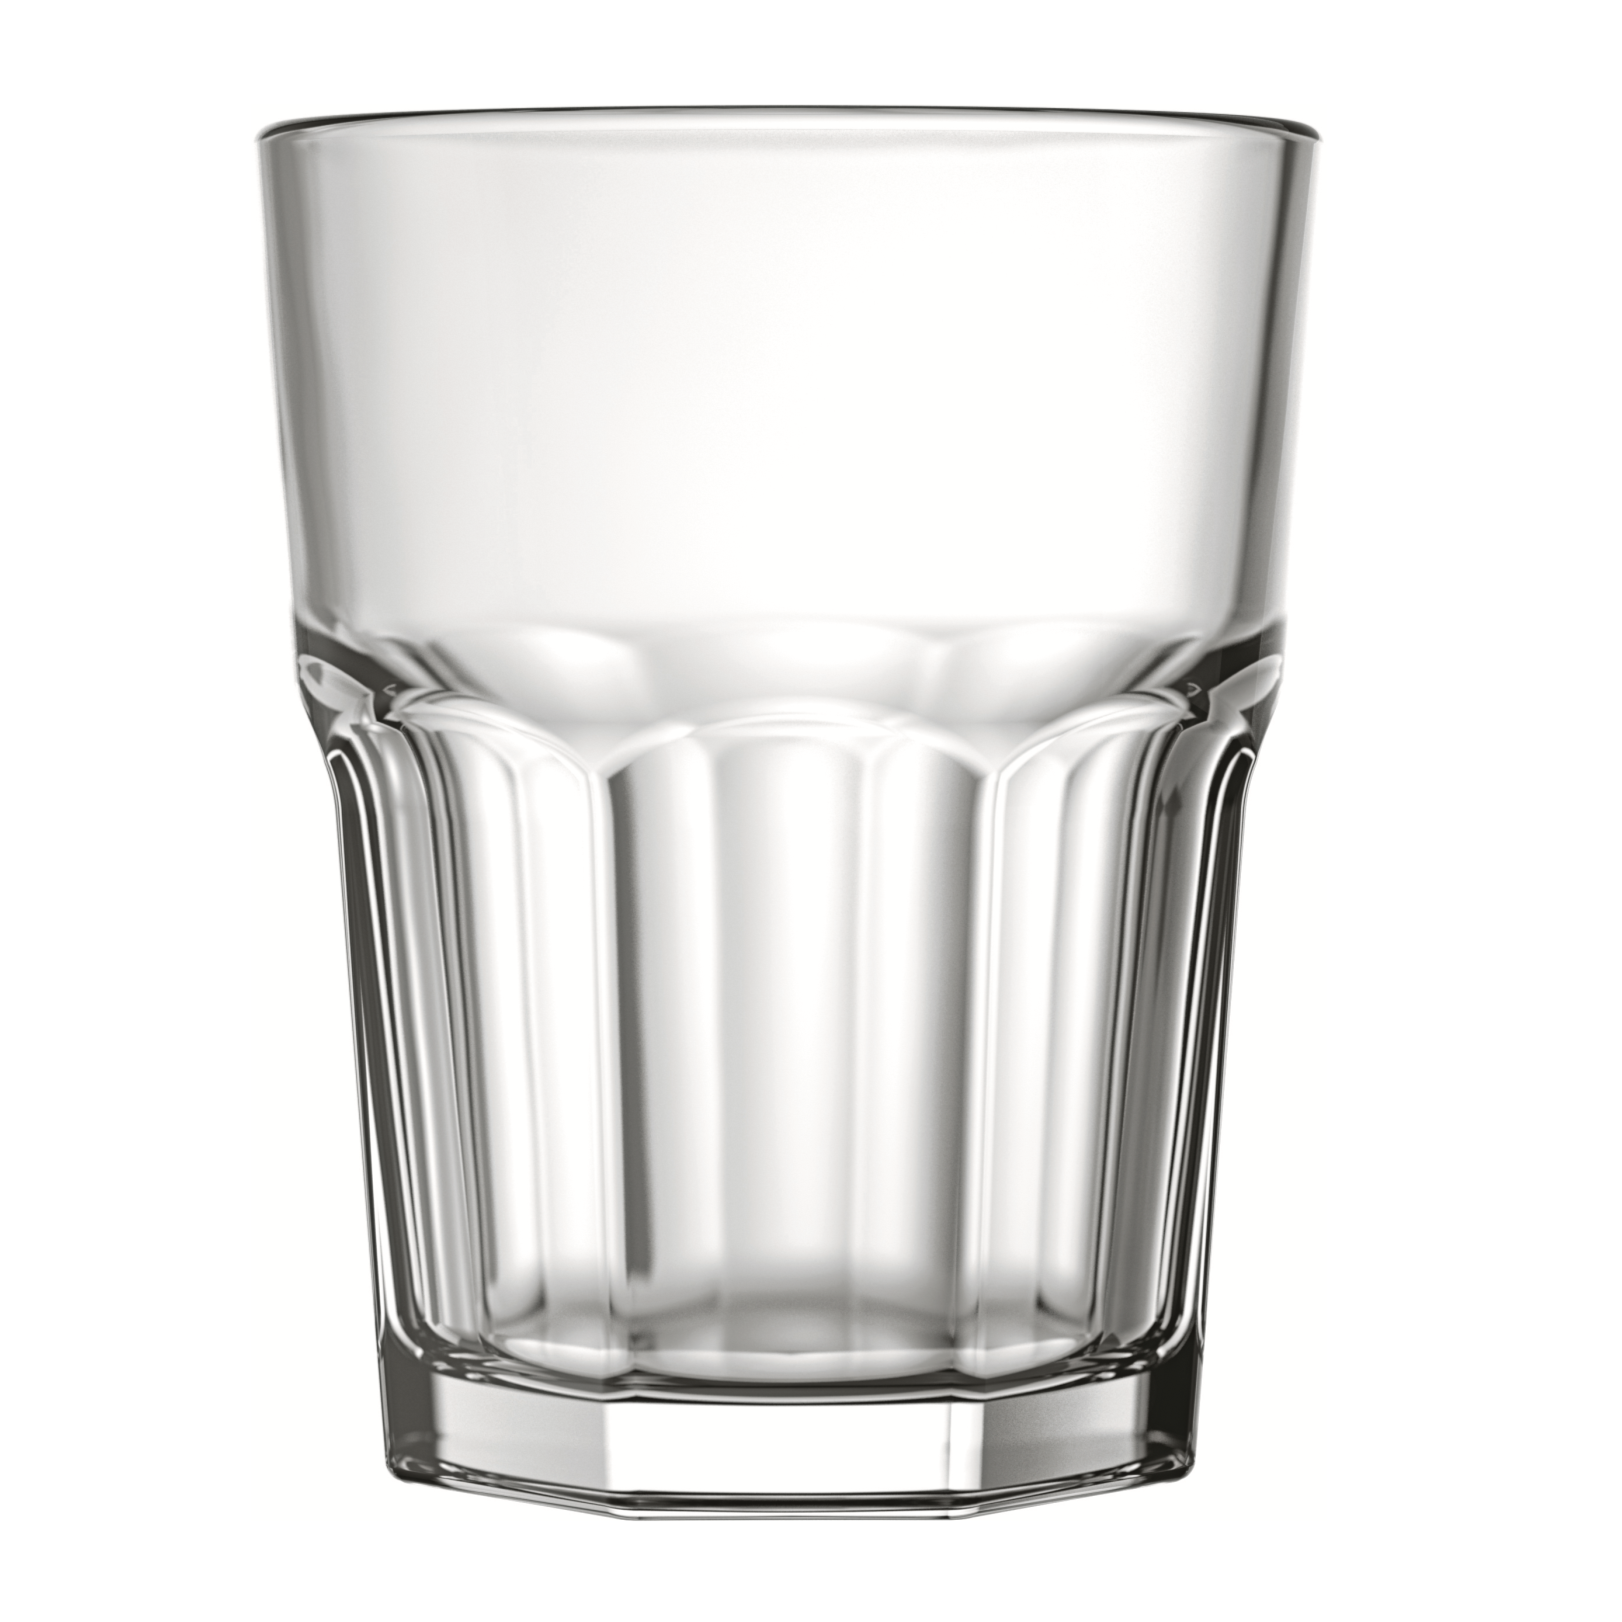 Copo de Vidro 60ml Transparente - Bristol Nadir